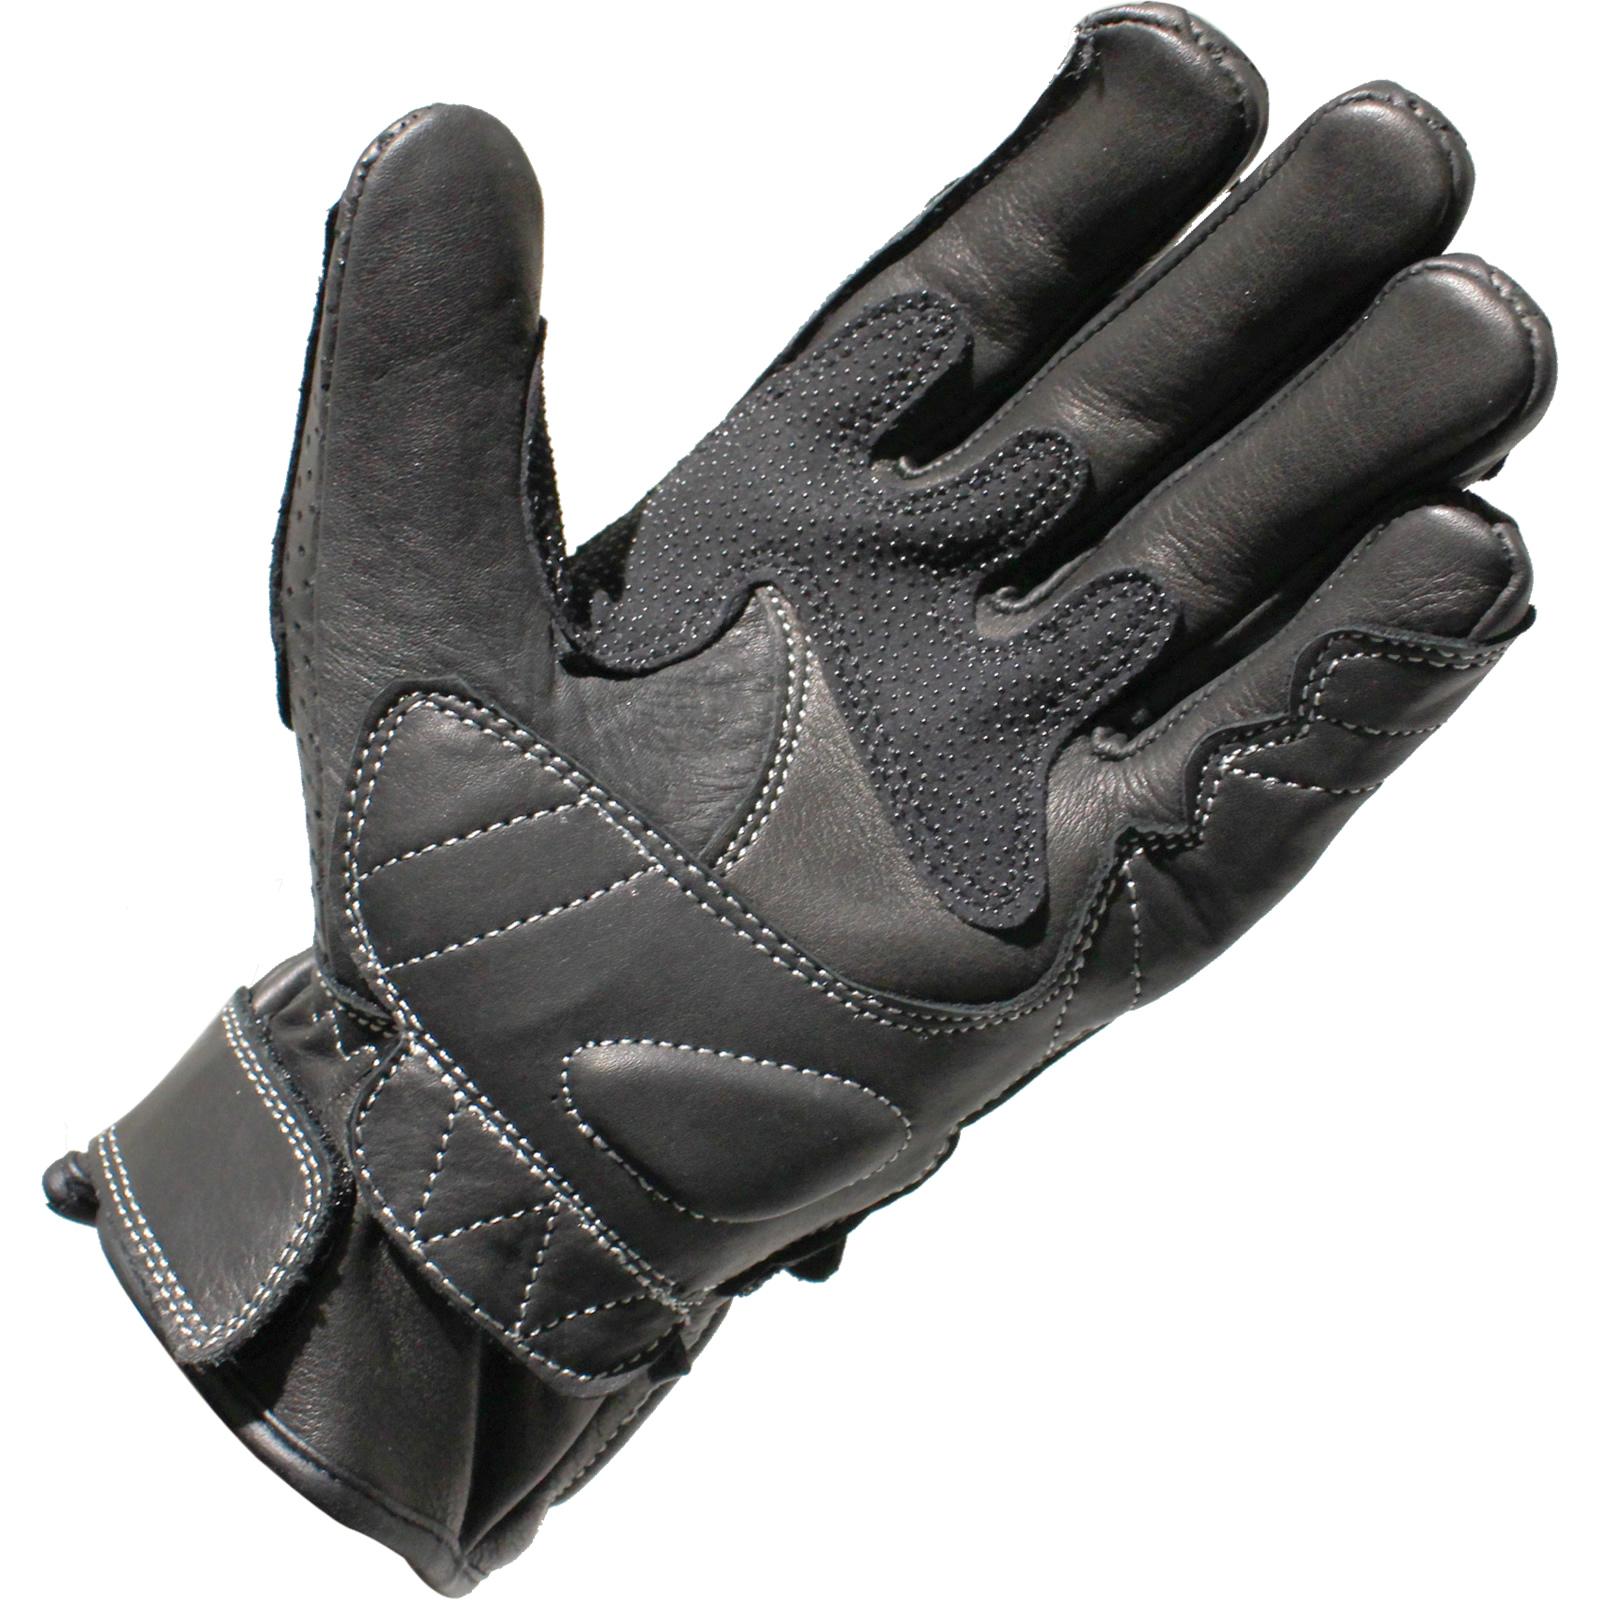 Agrius Ambush Short Motorcycle Gloves